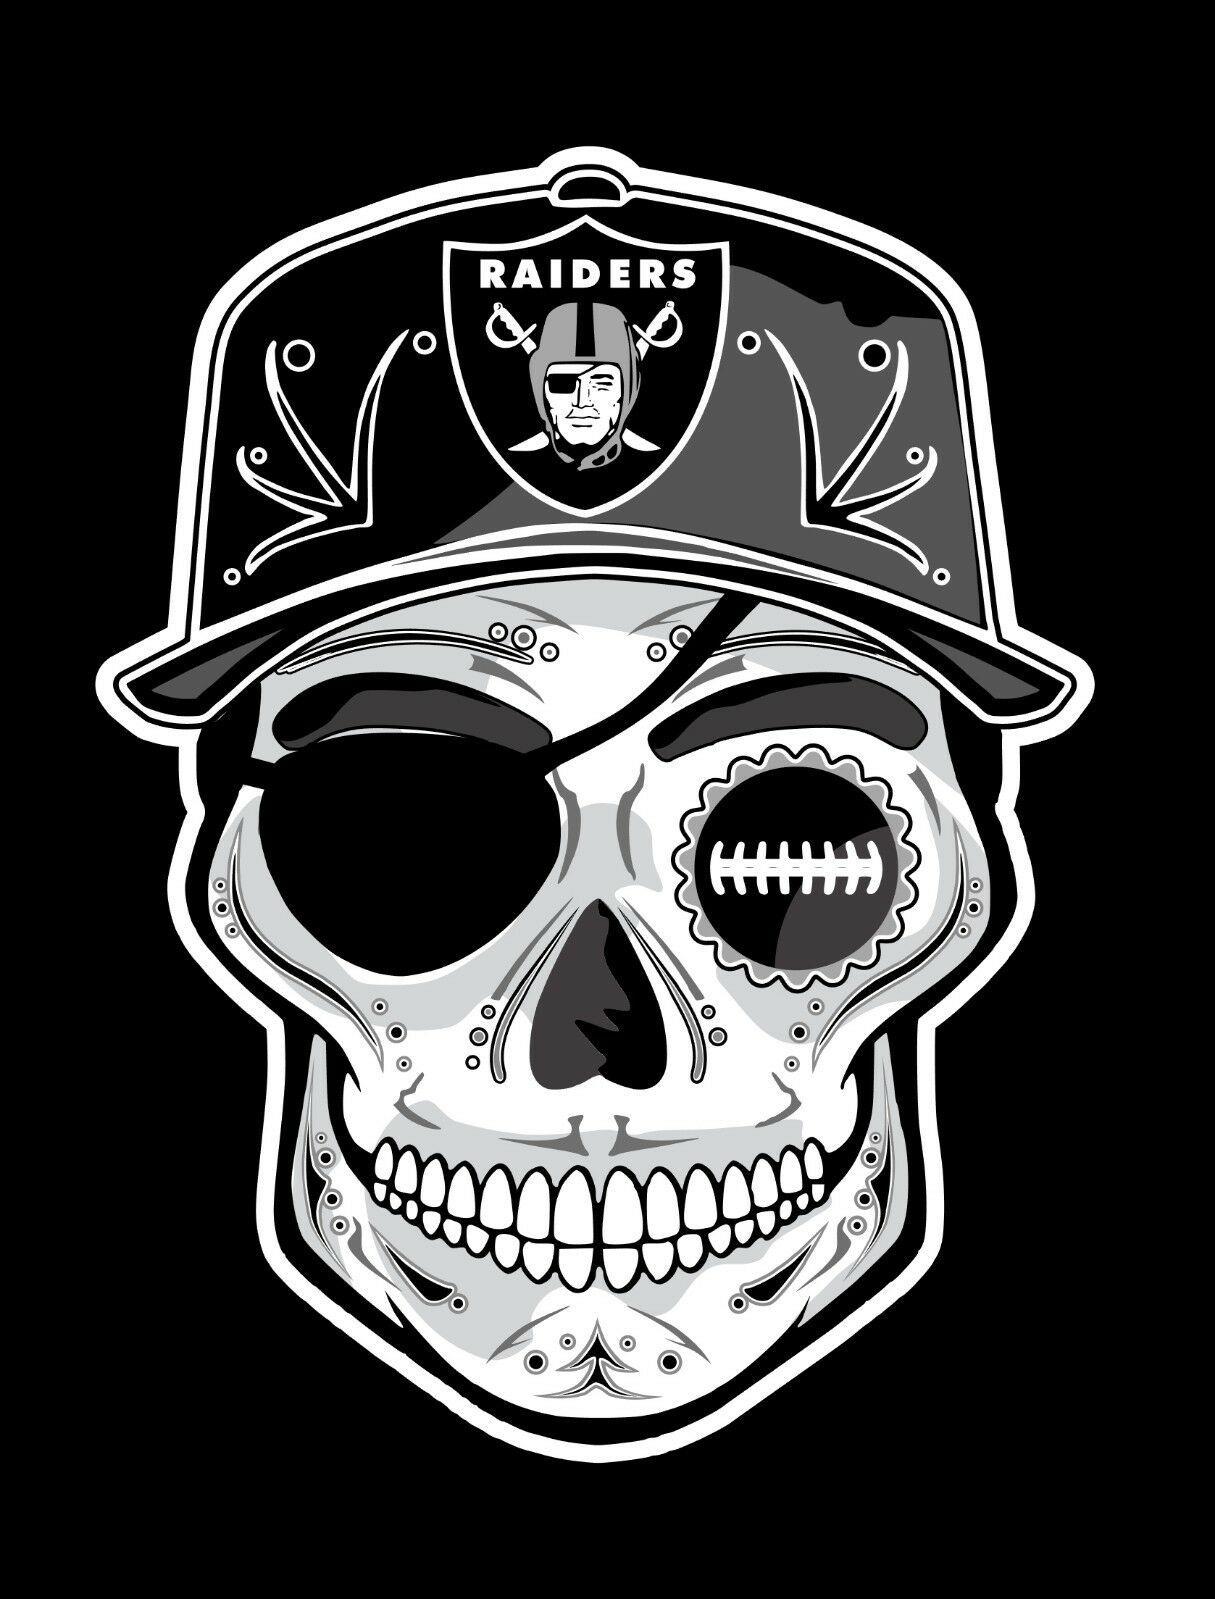 Buy 1 Get 1 Free Bogo Las Vegas Raiders 4 Inch Day Of The Dead Sugar Skull Sticker Decal Skull Sticker Raiders Vinyl Decal Stickers [ 1599 x 1215 Pixel ]